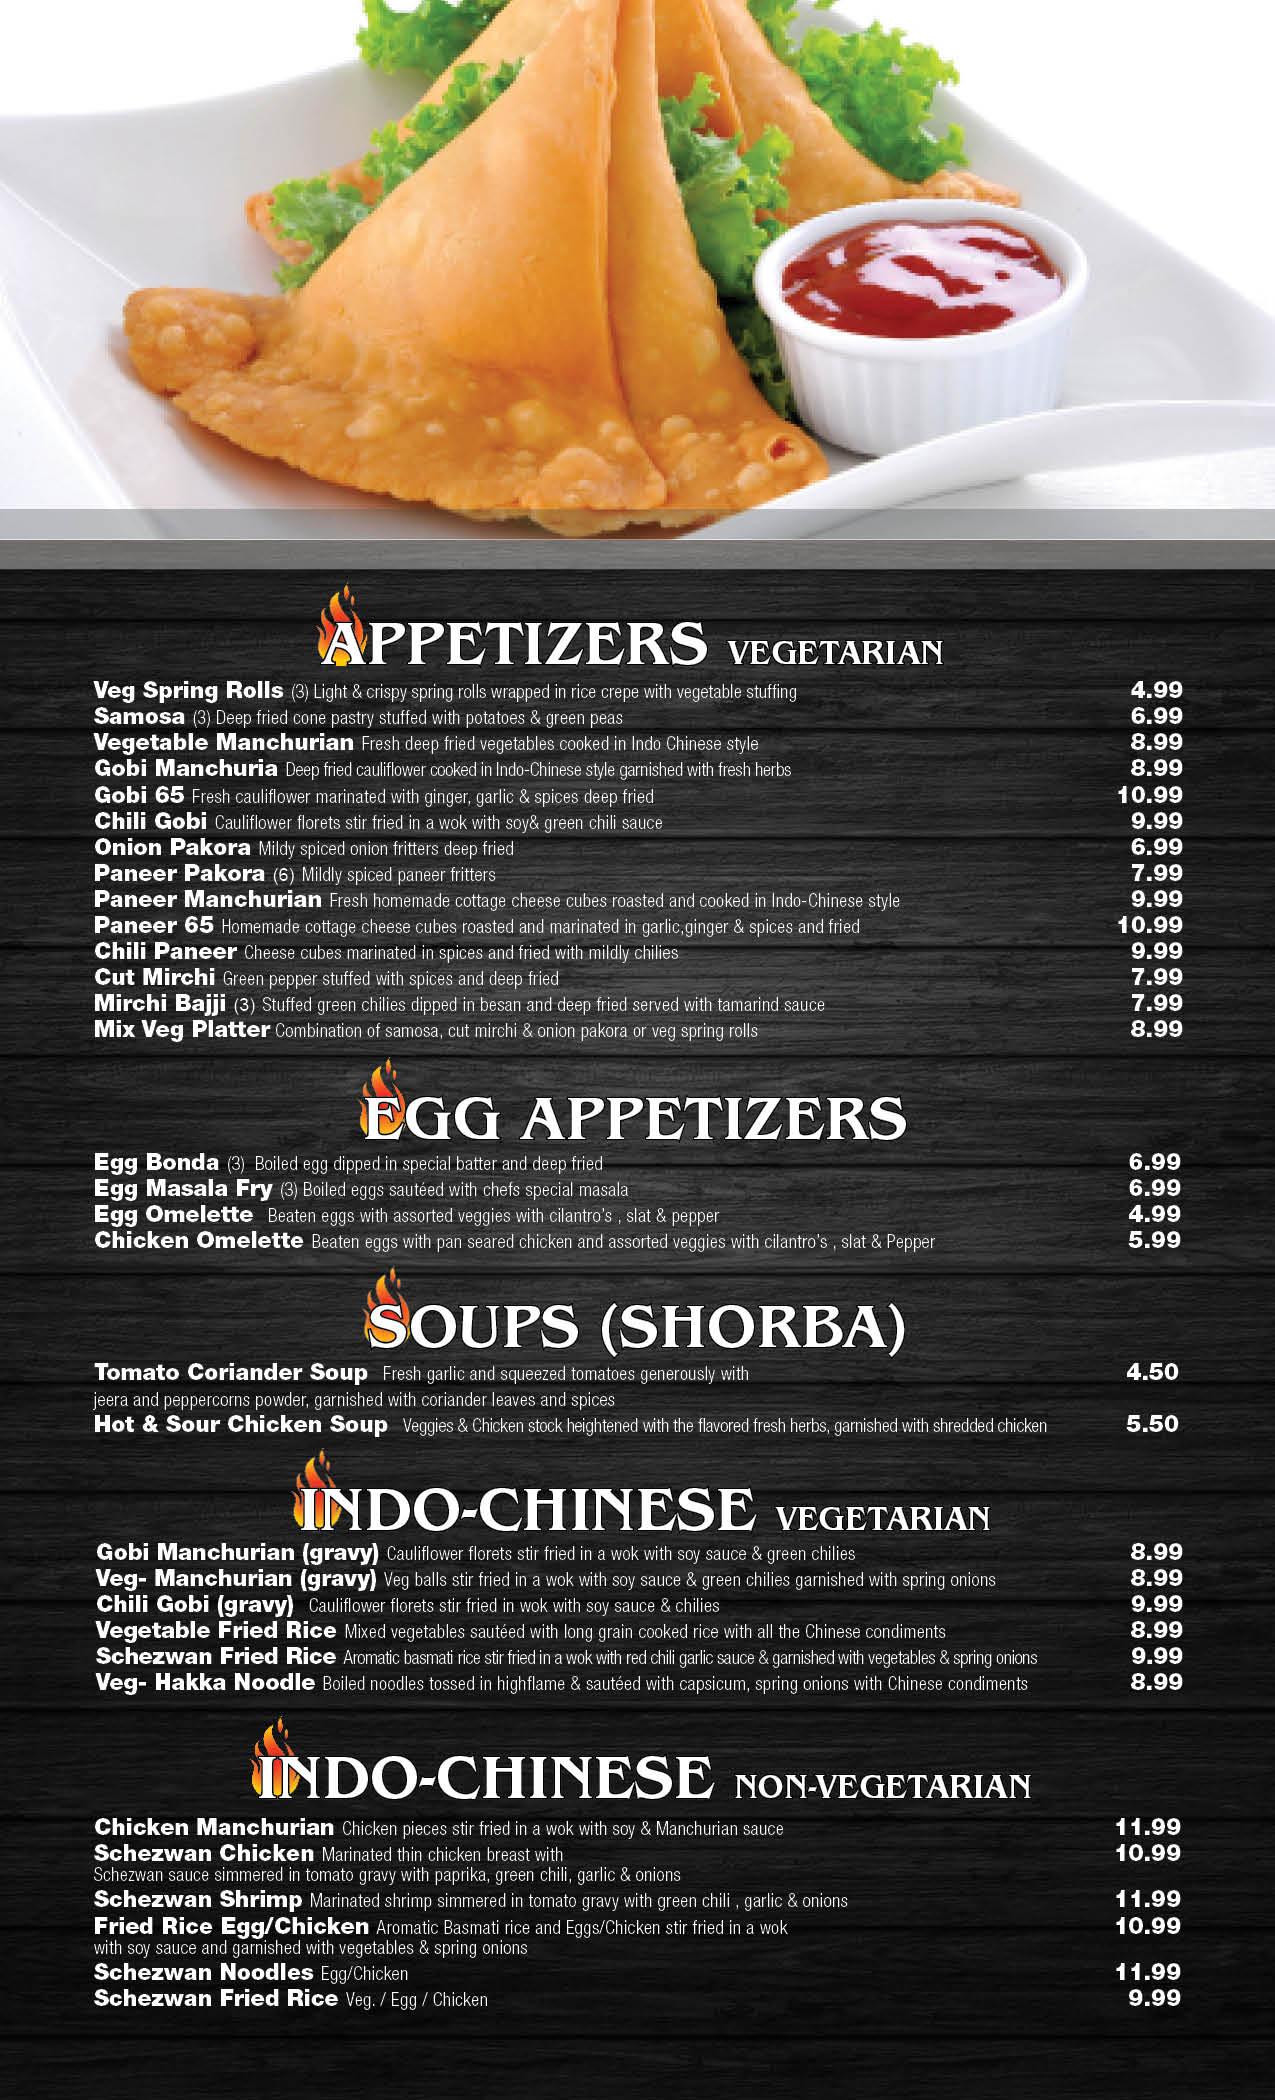 House of Biryani & Kebab's_Dine In 3